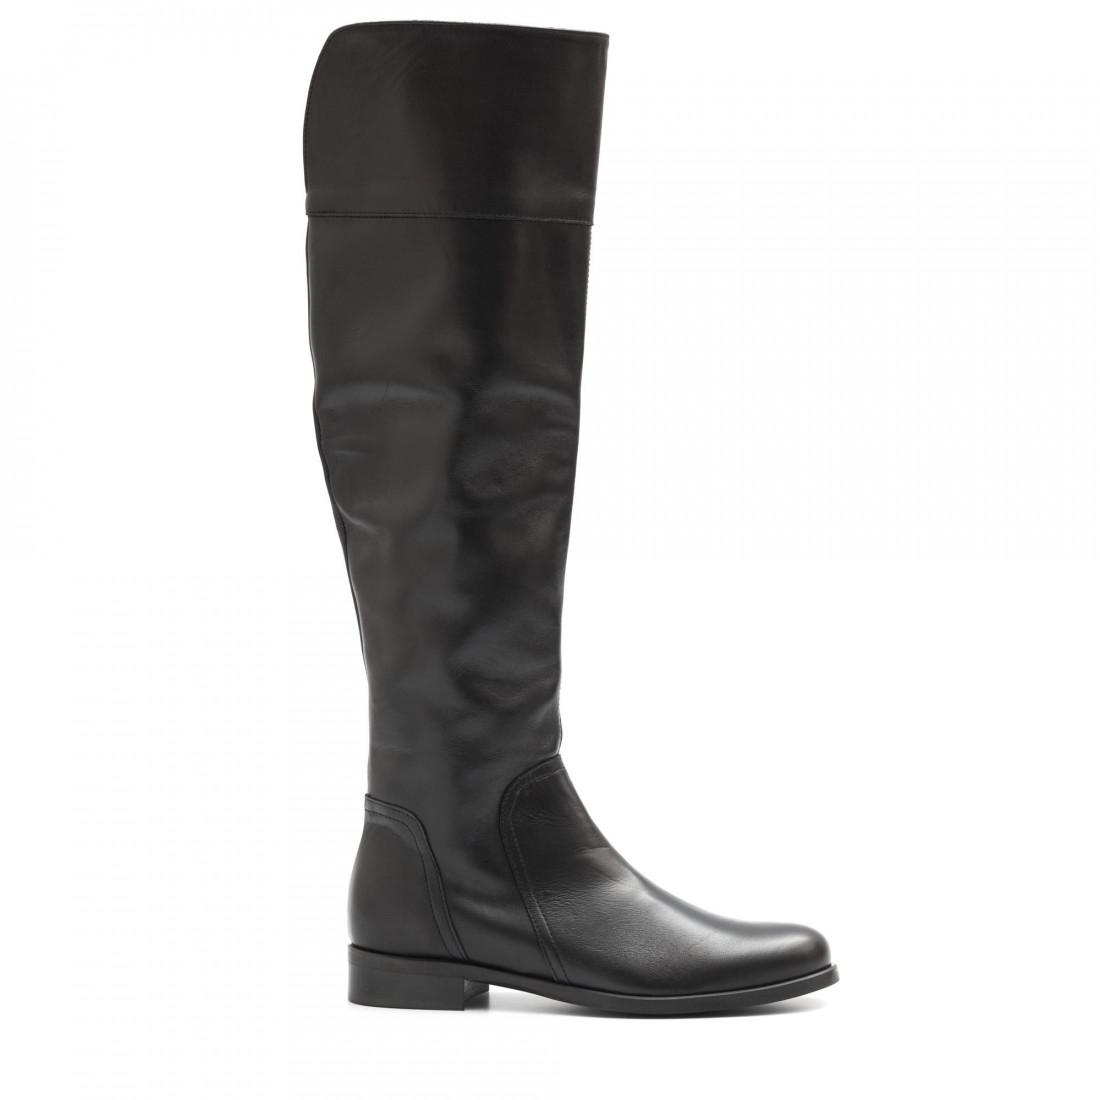 boots woman sangiorgio ng 781cuba nappa nero 4046